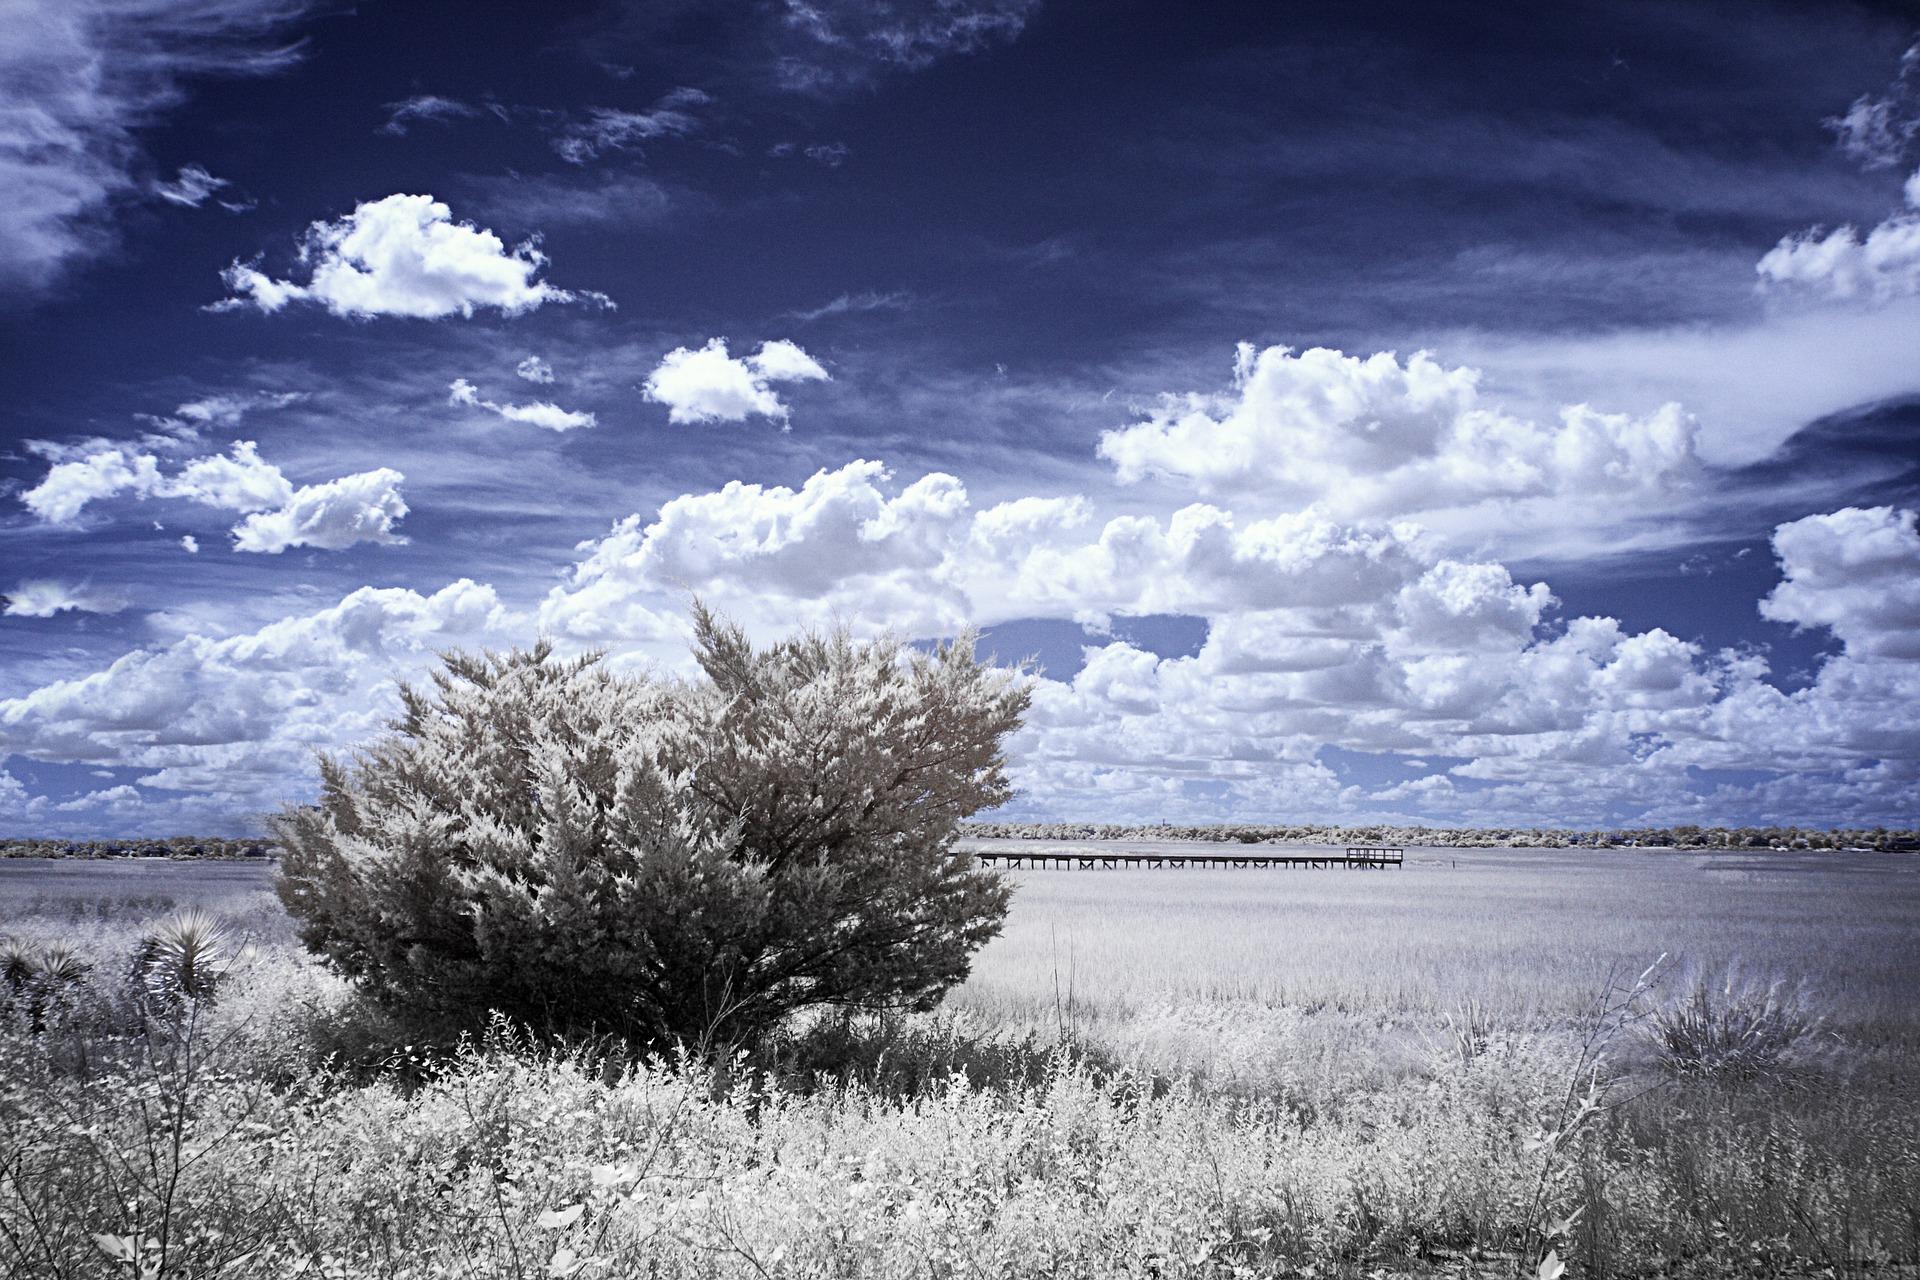 fotografia-infrarroja.jpg